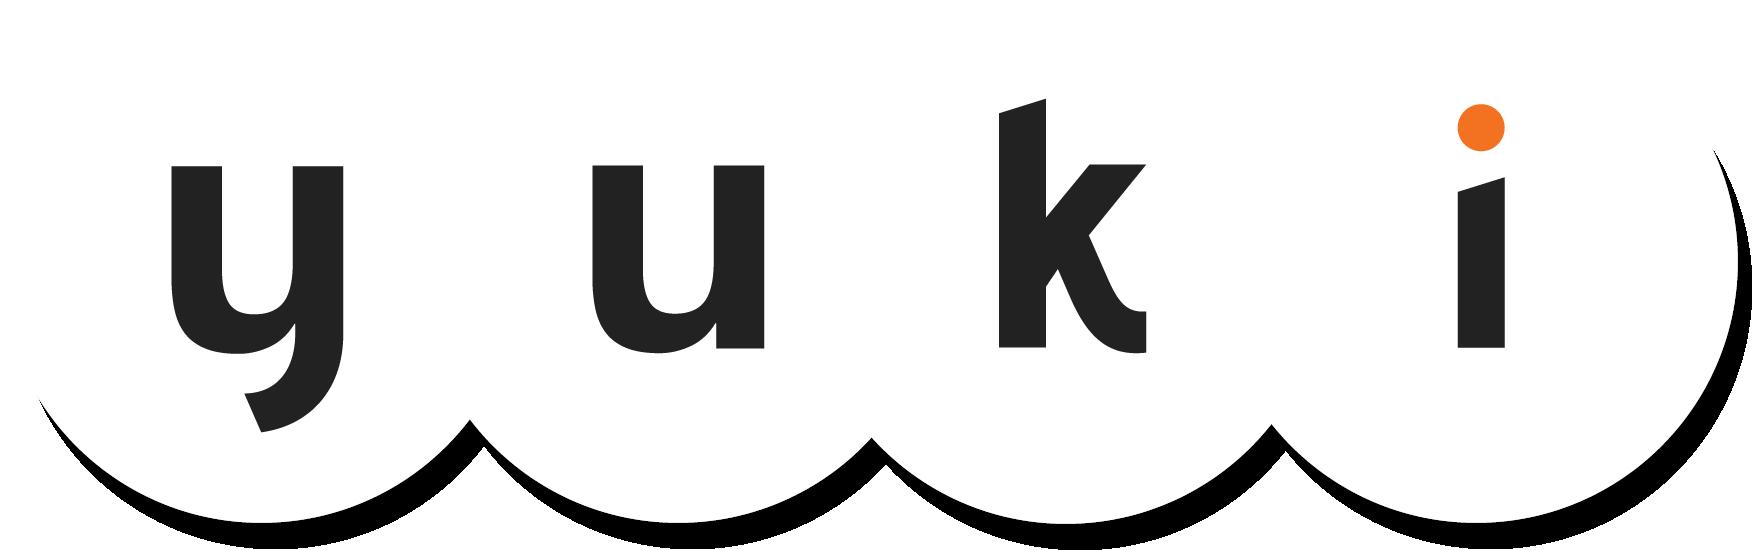 yuki-new-logo-rgb-standalone-2-1